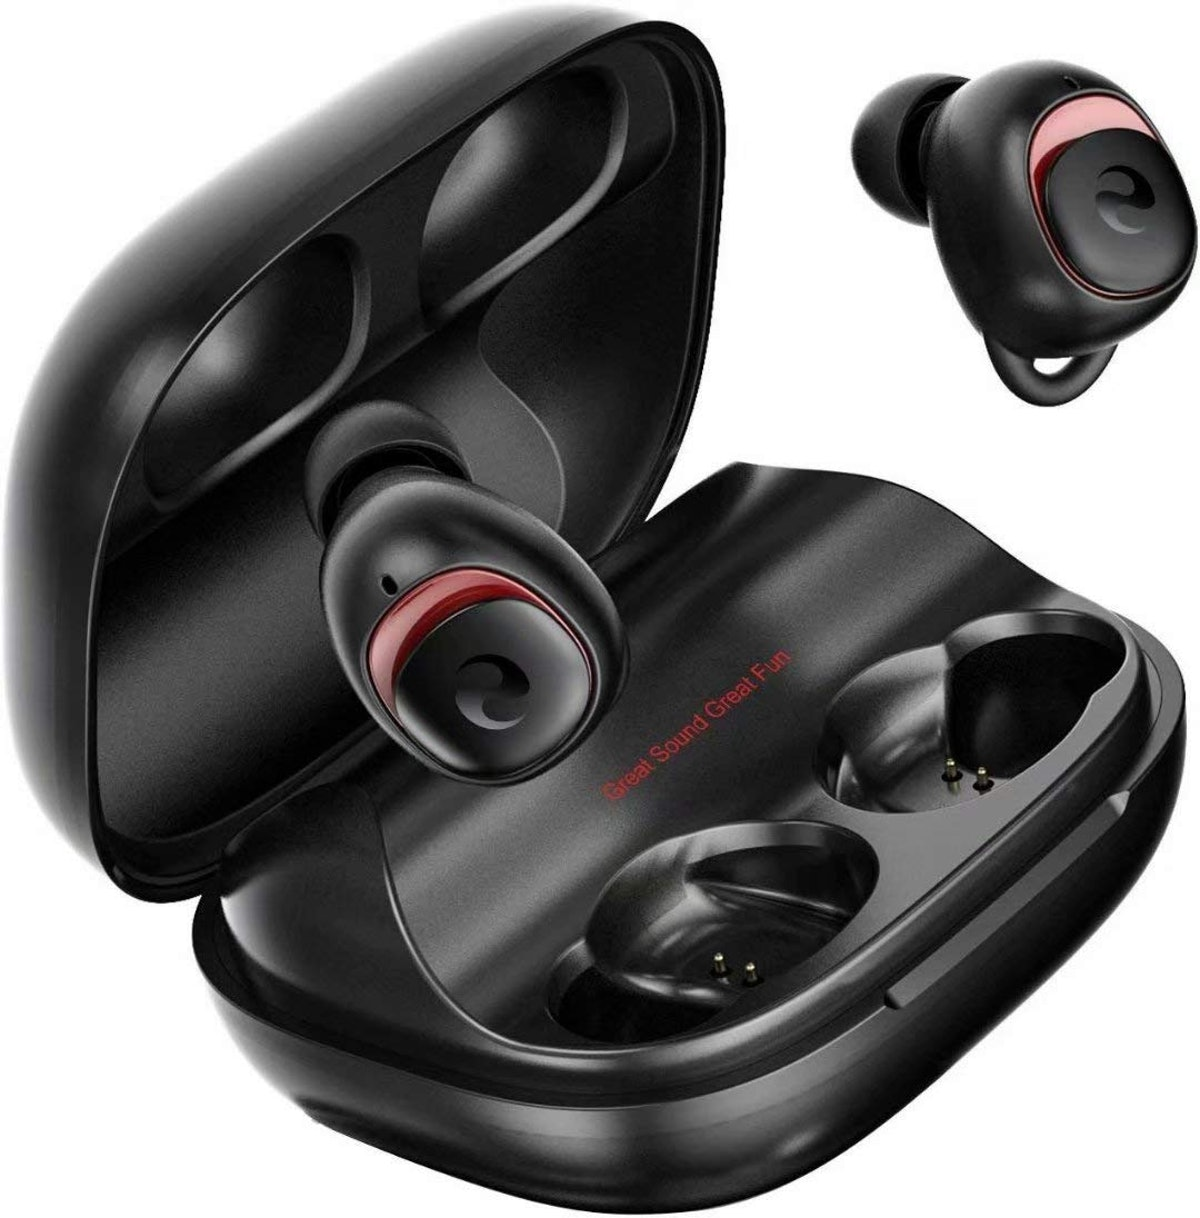 OFUSHO Wireless Bluetooth Earbuds